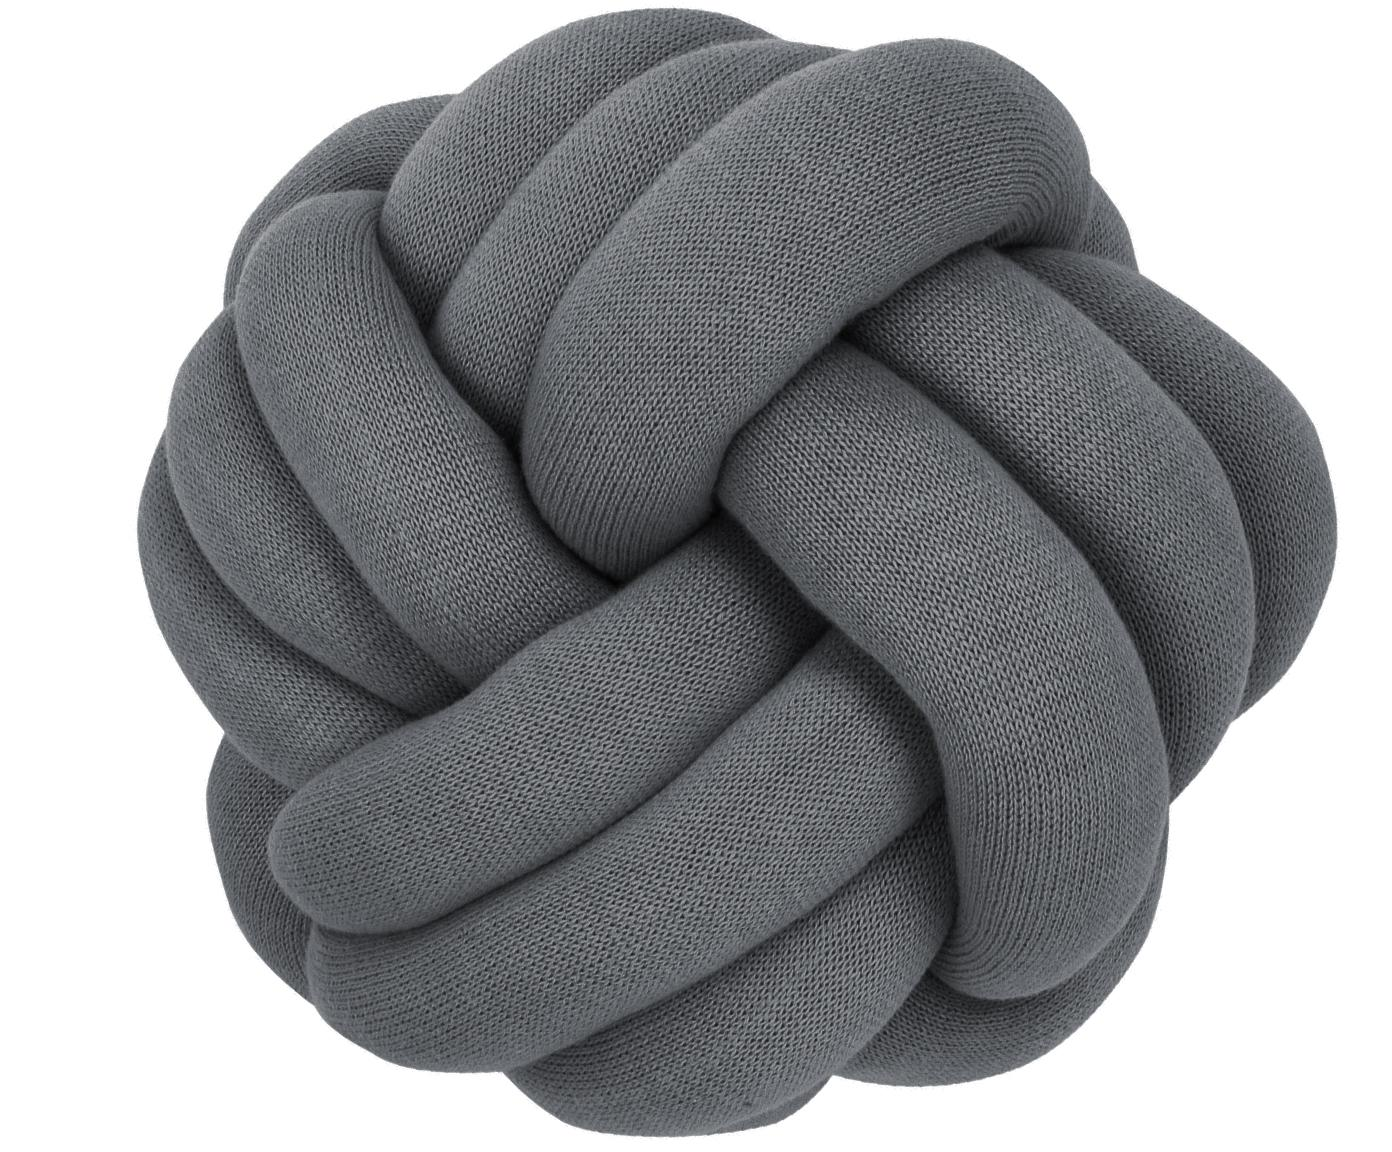 Cojín nudo Twist, Gris oscuro, Ø 30 cm